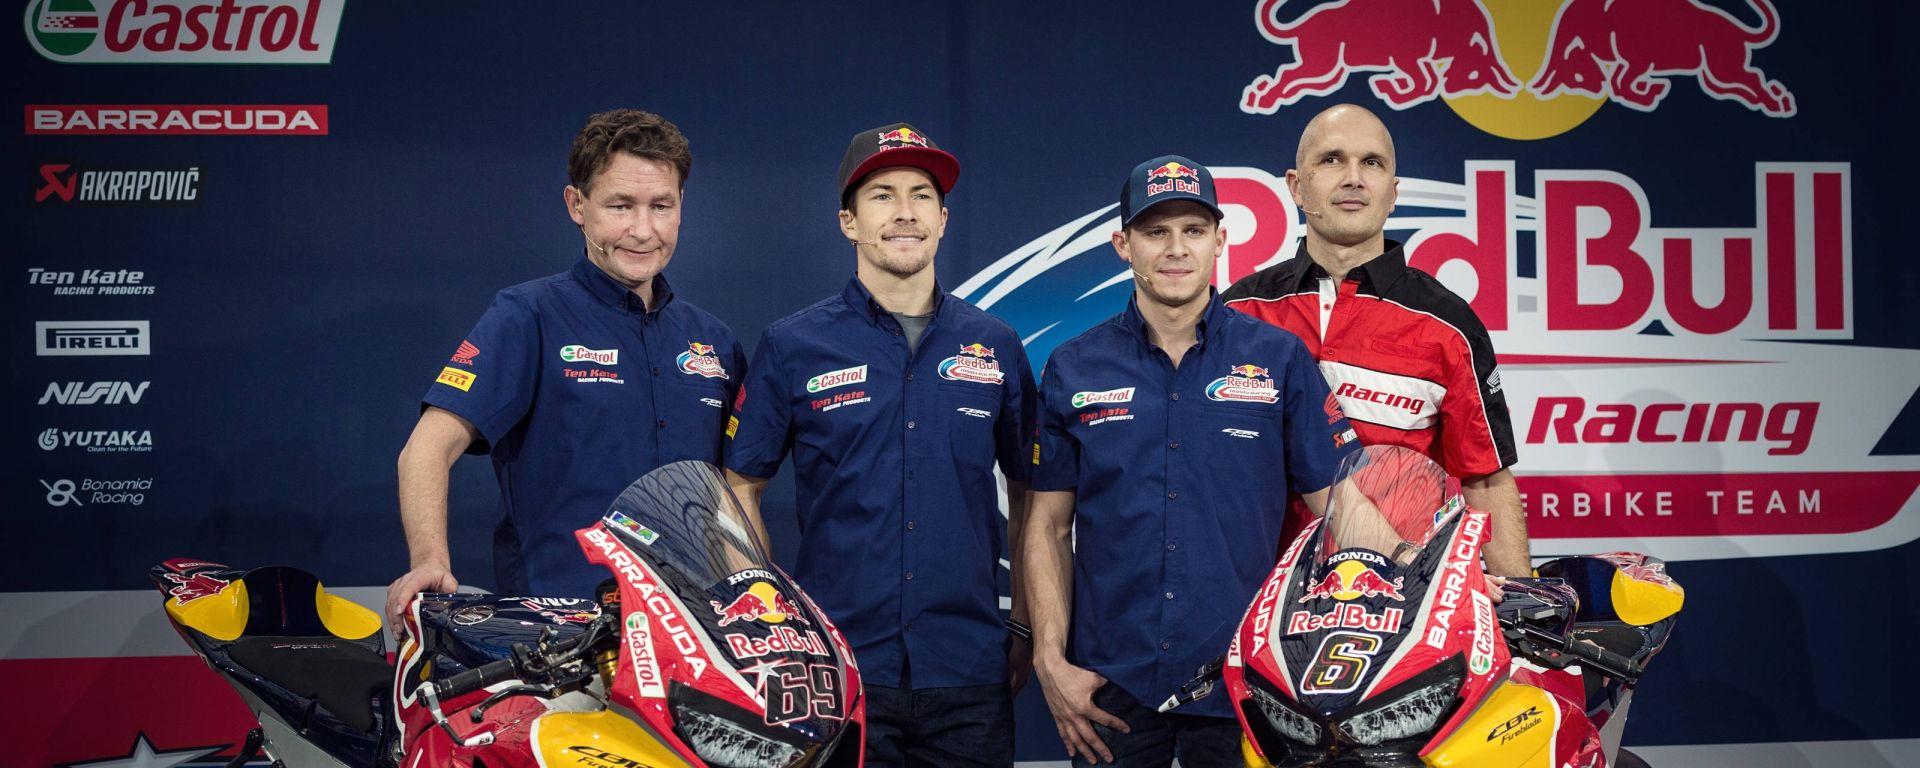 SBK 2017: Nicky Hayden e Stefan Bradl hanno presentato il nuovo Red Bull Honda Superbike Team